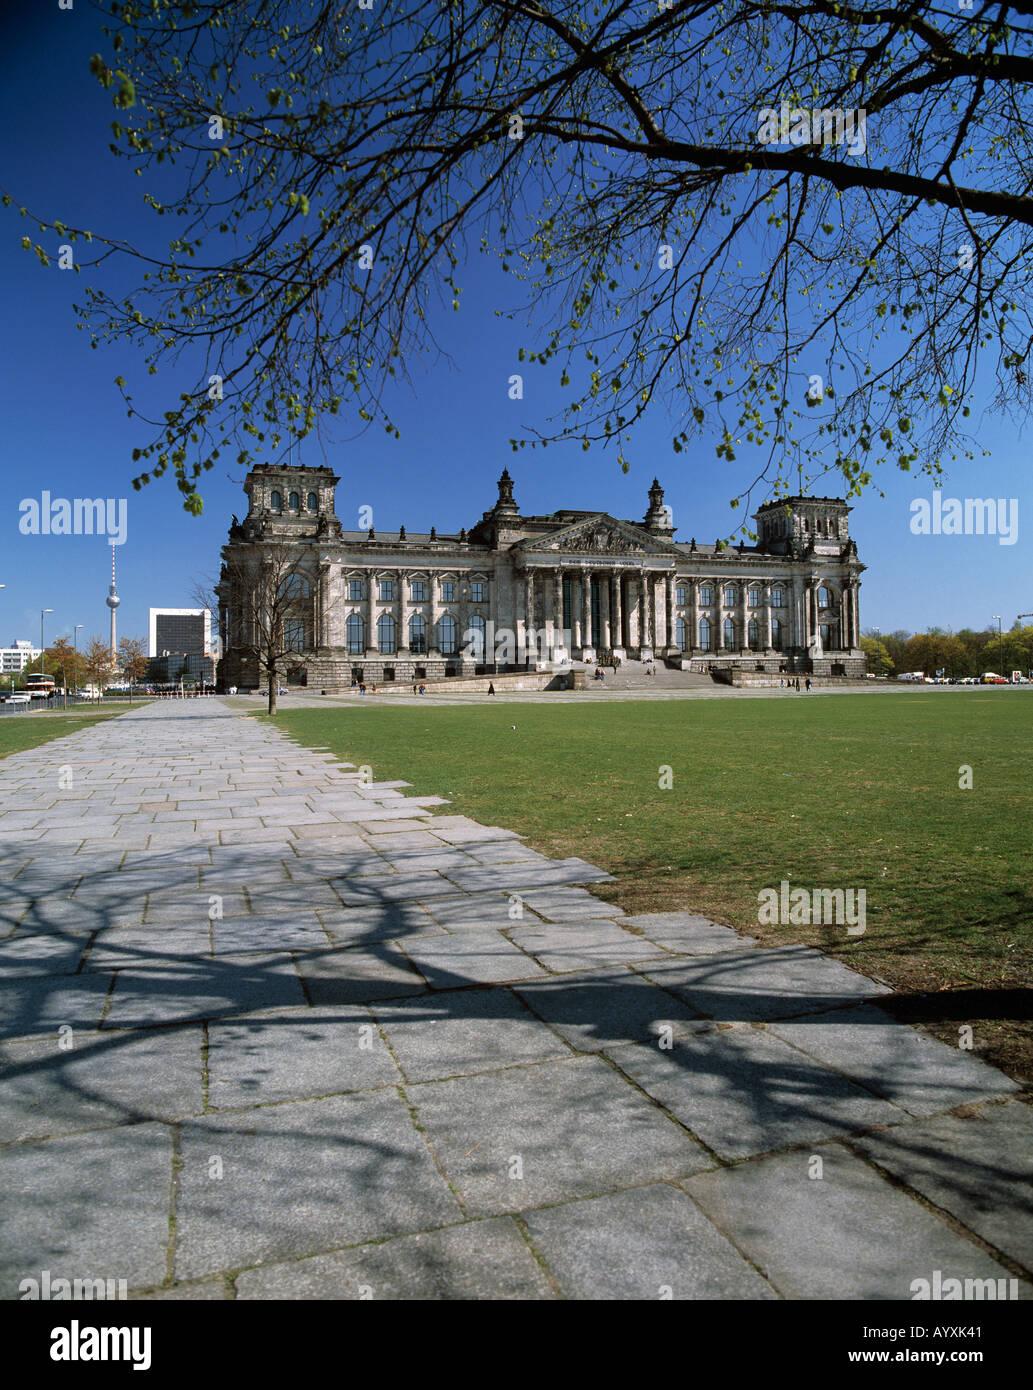 Reichstagsgebaeude, Berlin - Stock Image